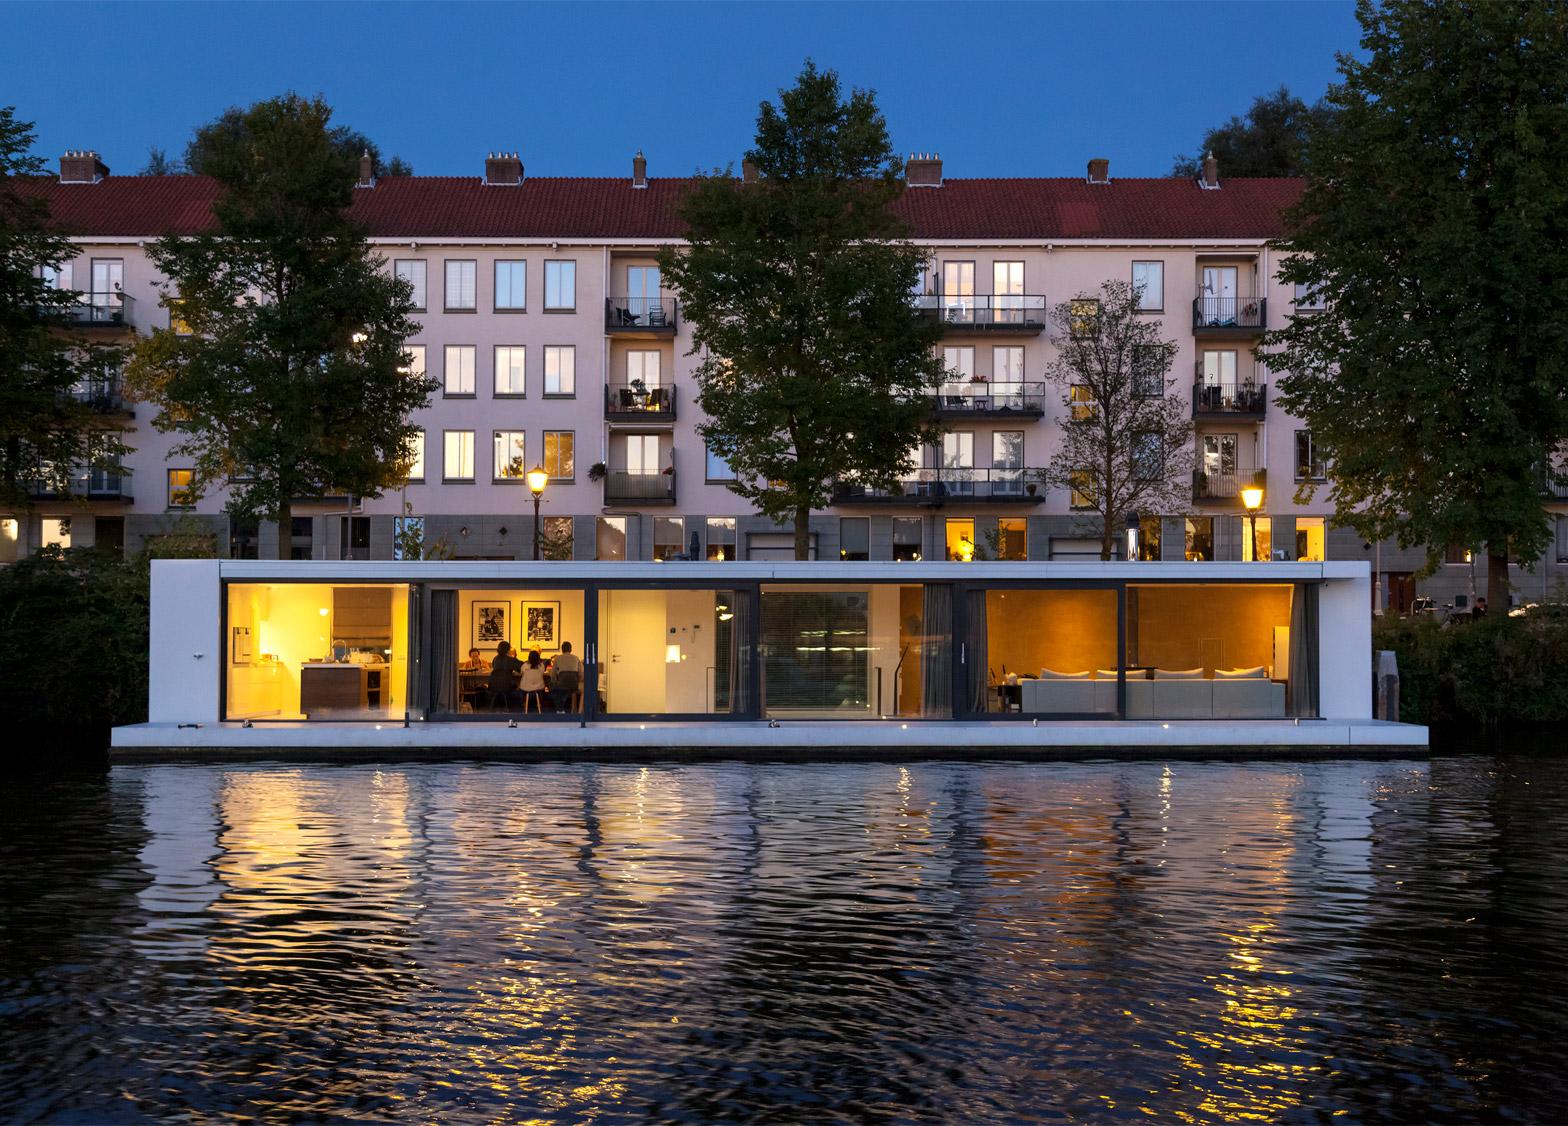 Amstel river house